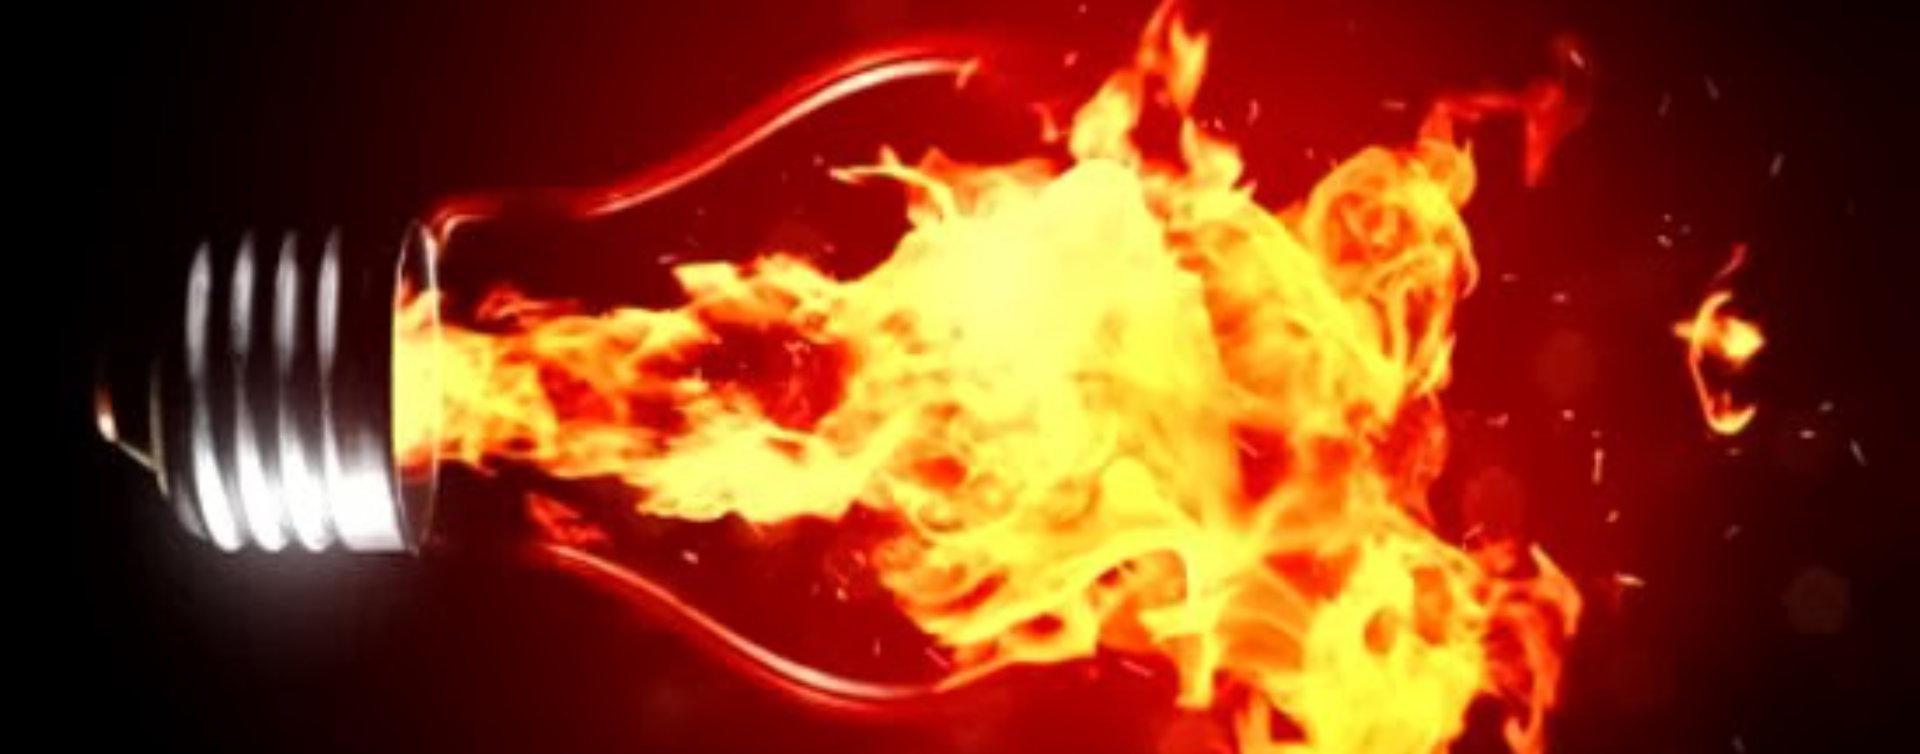 lightbul on fire